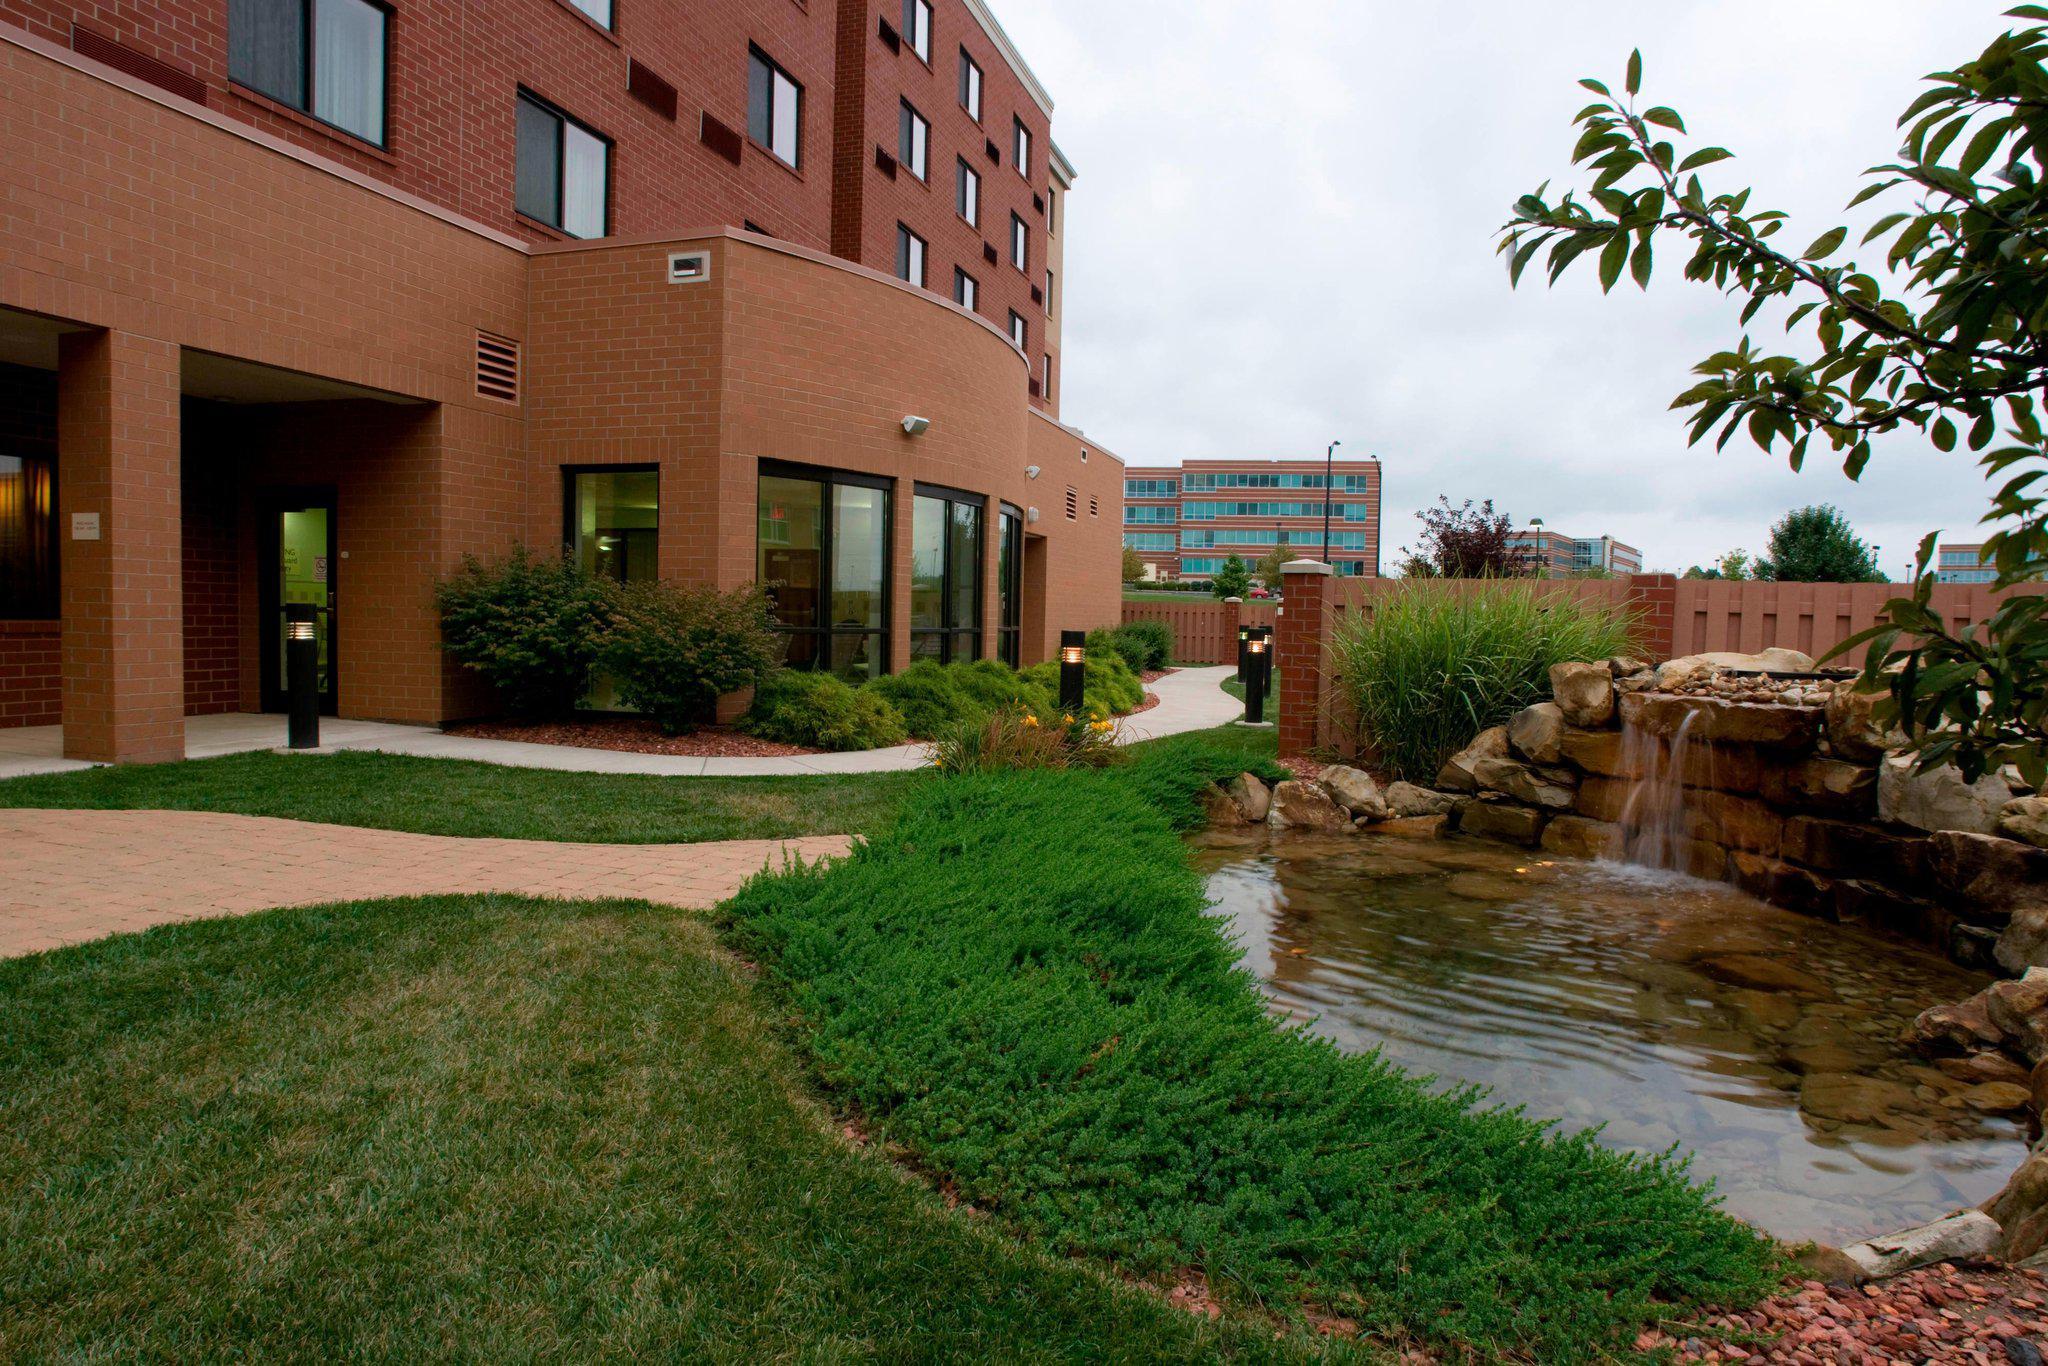 Courtyard by Marriott Cincinnati North at Union Centre